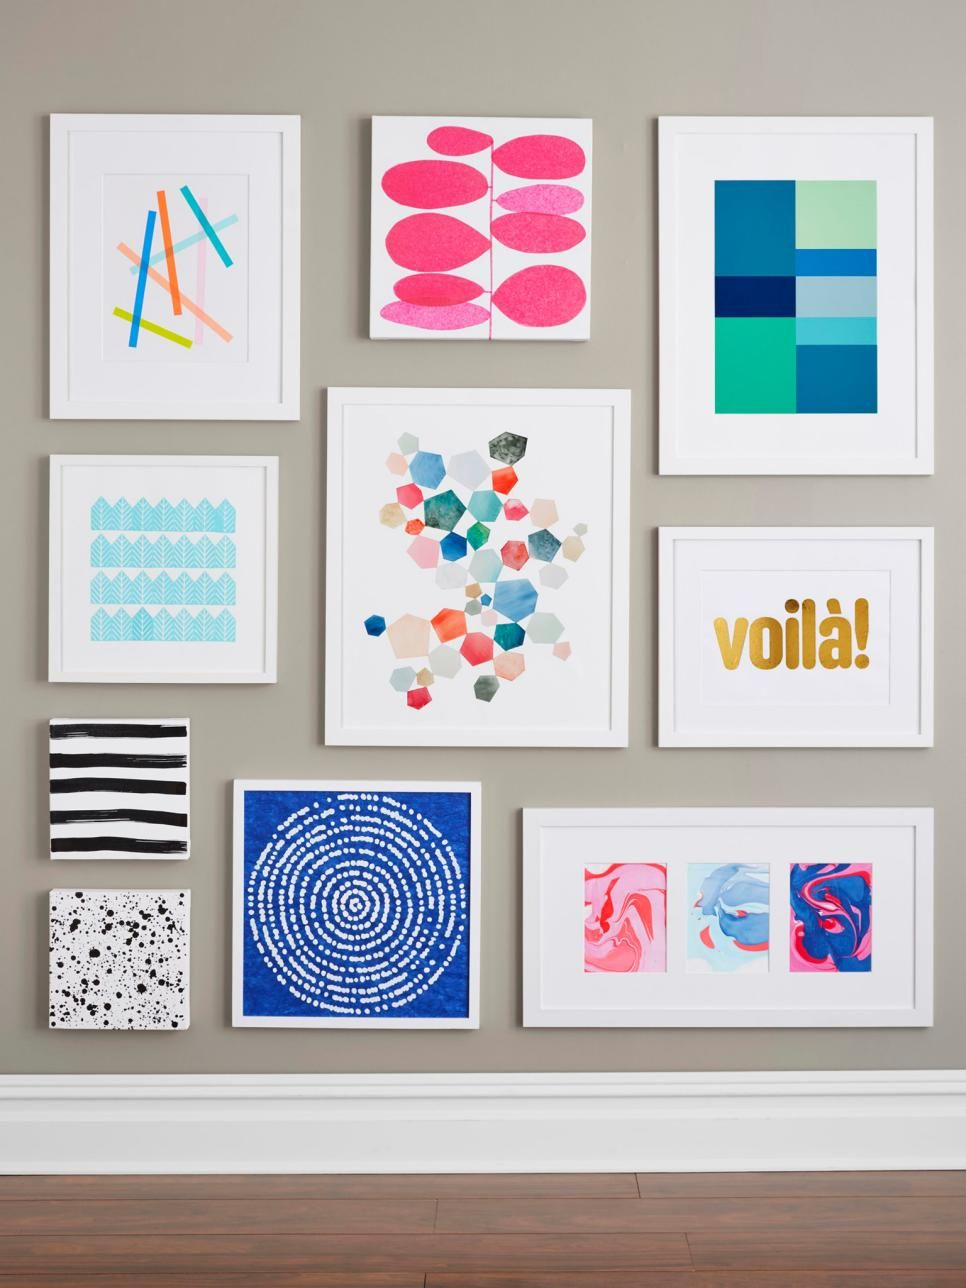 Impressive Diy Stencil Ideas From Popular Home Decor Magazines Diy Wall Painting Wall Art Diy Easy Unique Wall Art Diy